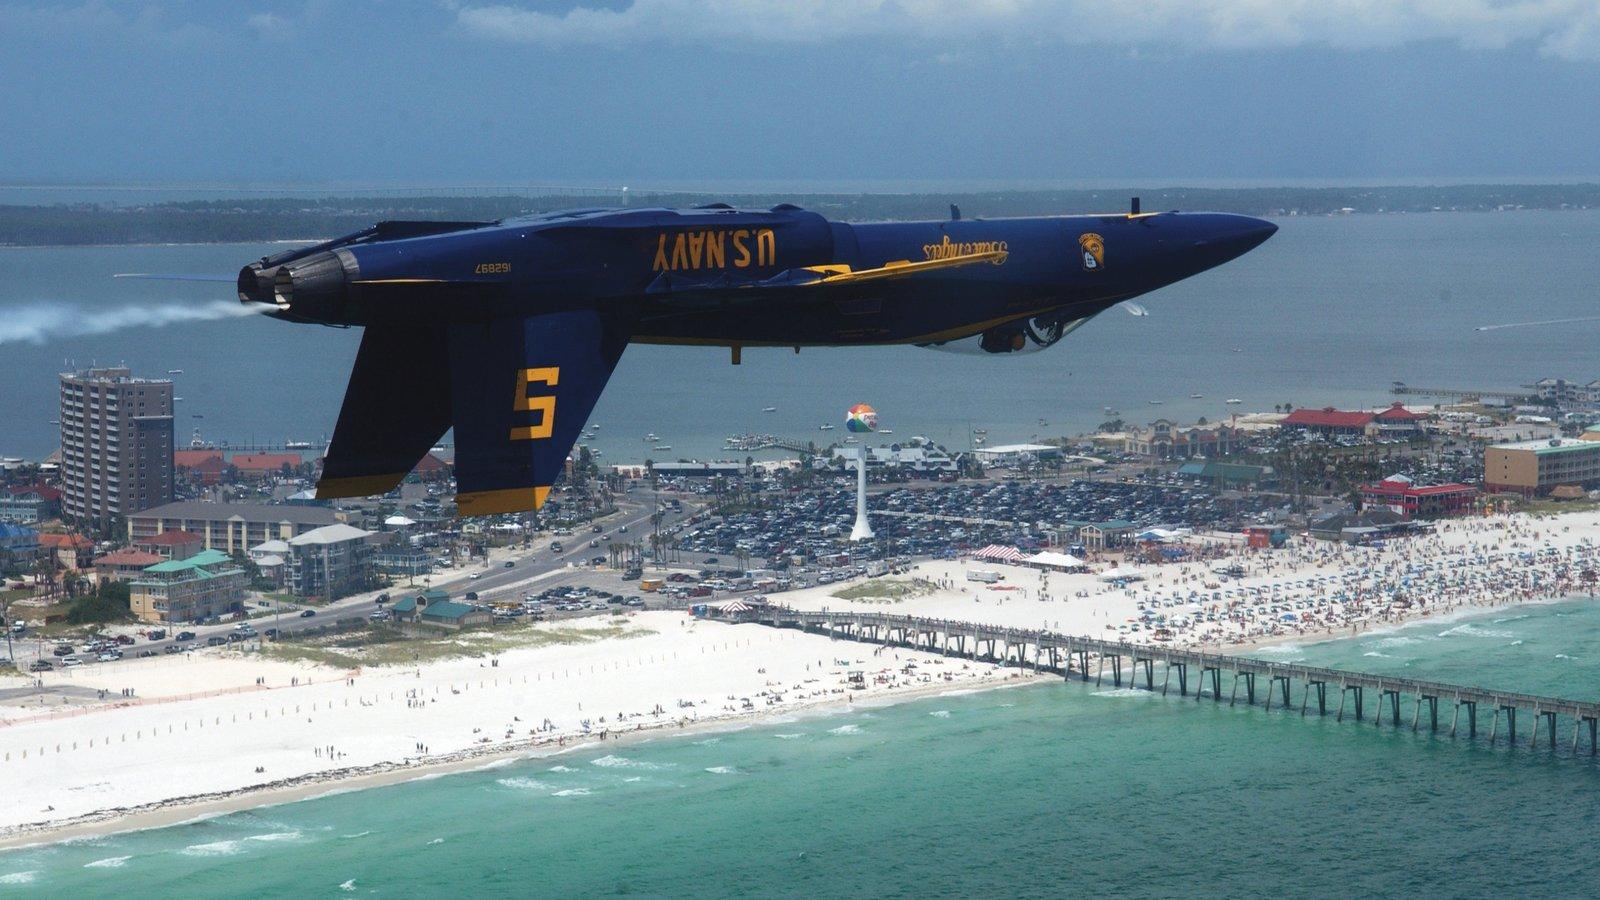 Pensacola Beach showing a sandy beach, an aircraft and tropical scenes